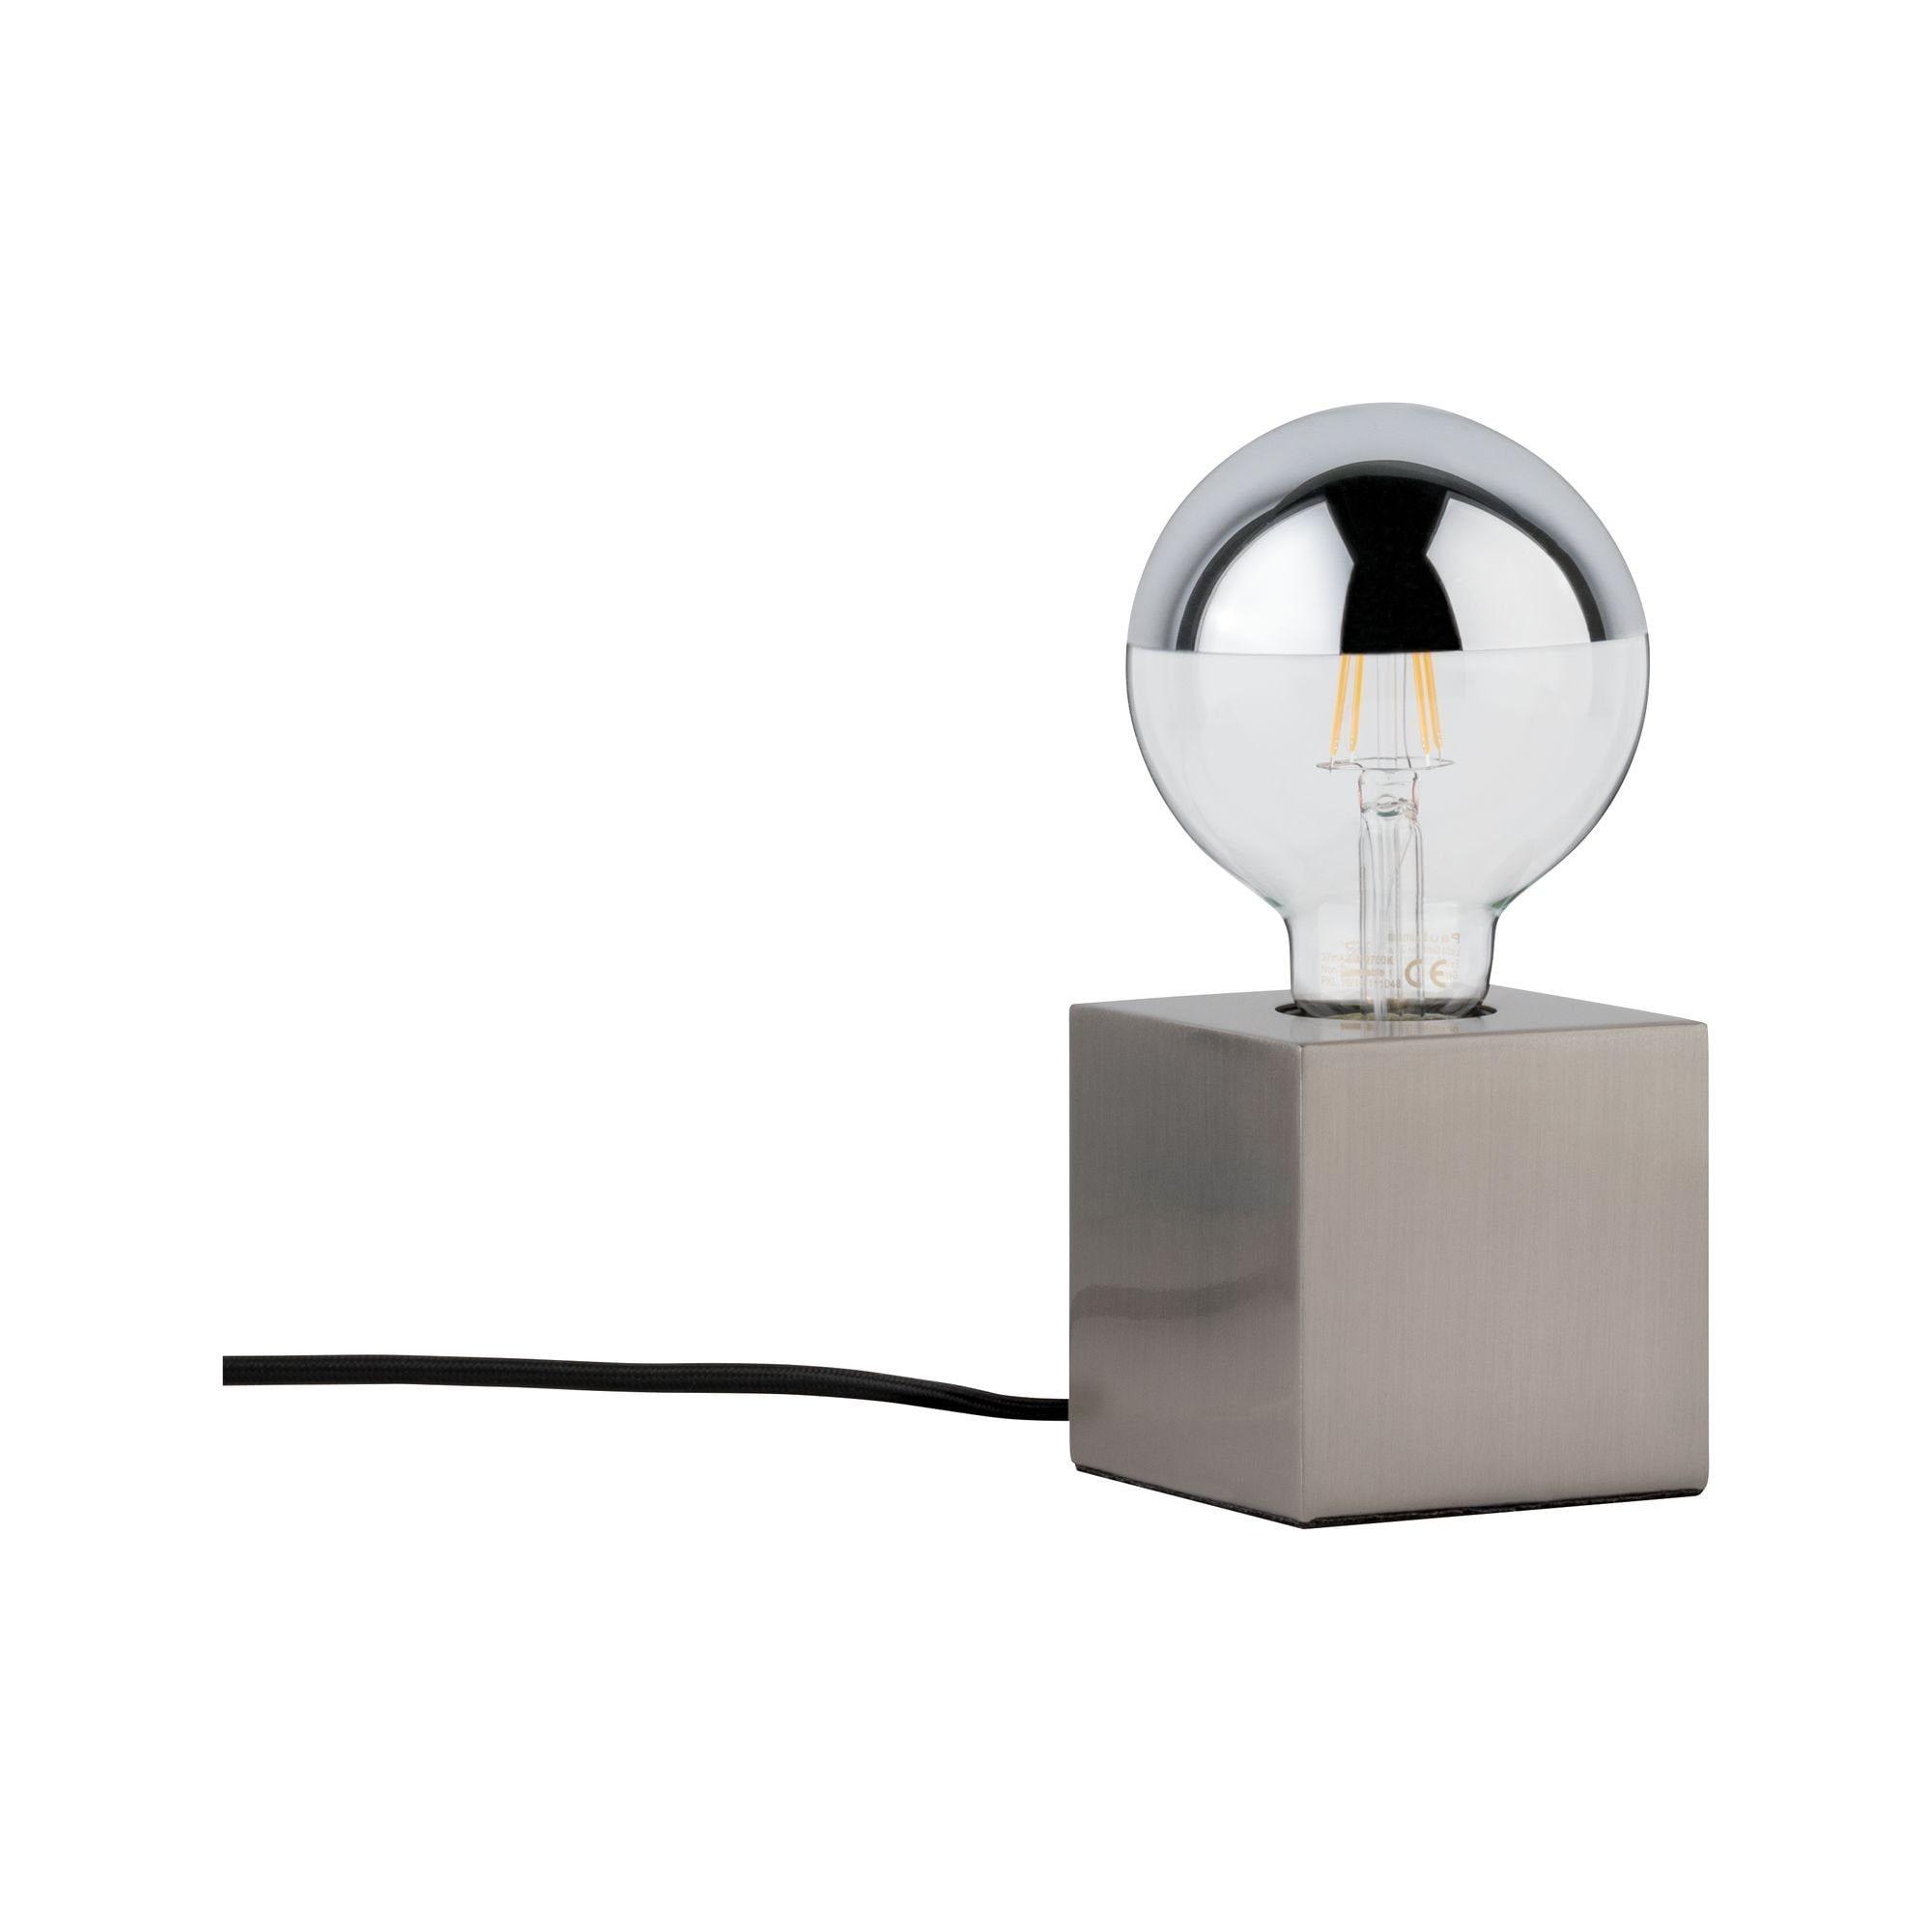 Paulmann,LED Tischleuchte Kura Eisen gebürstet, max. 20W E27